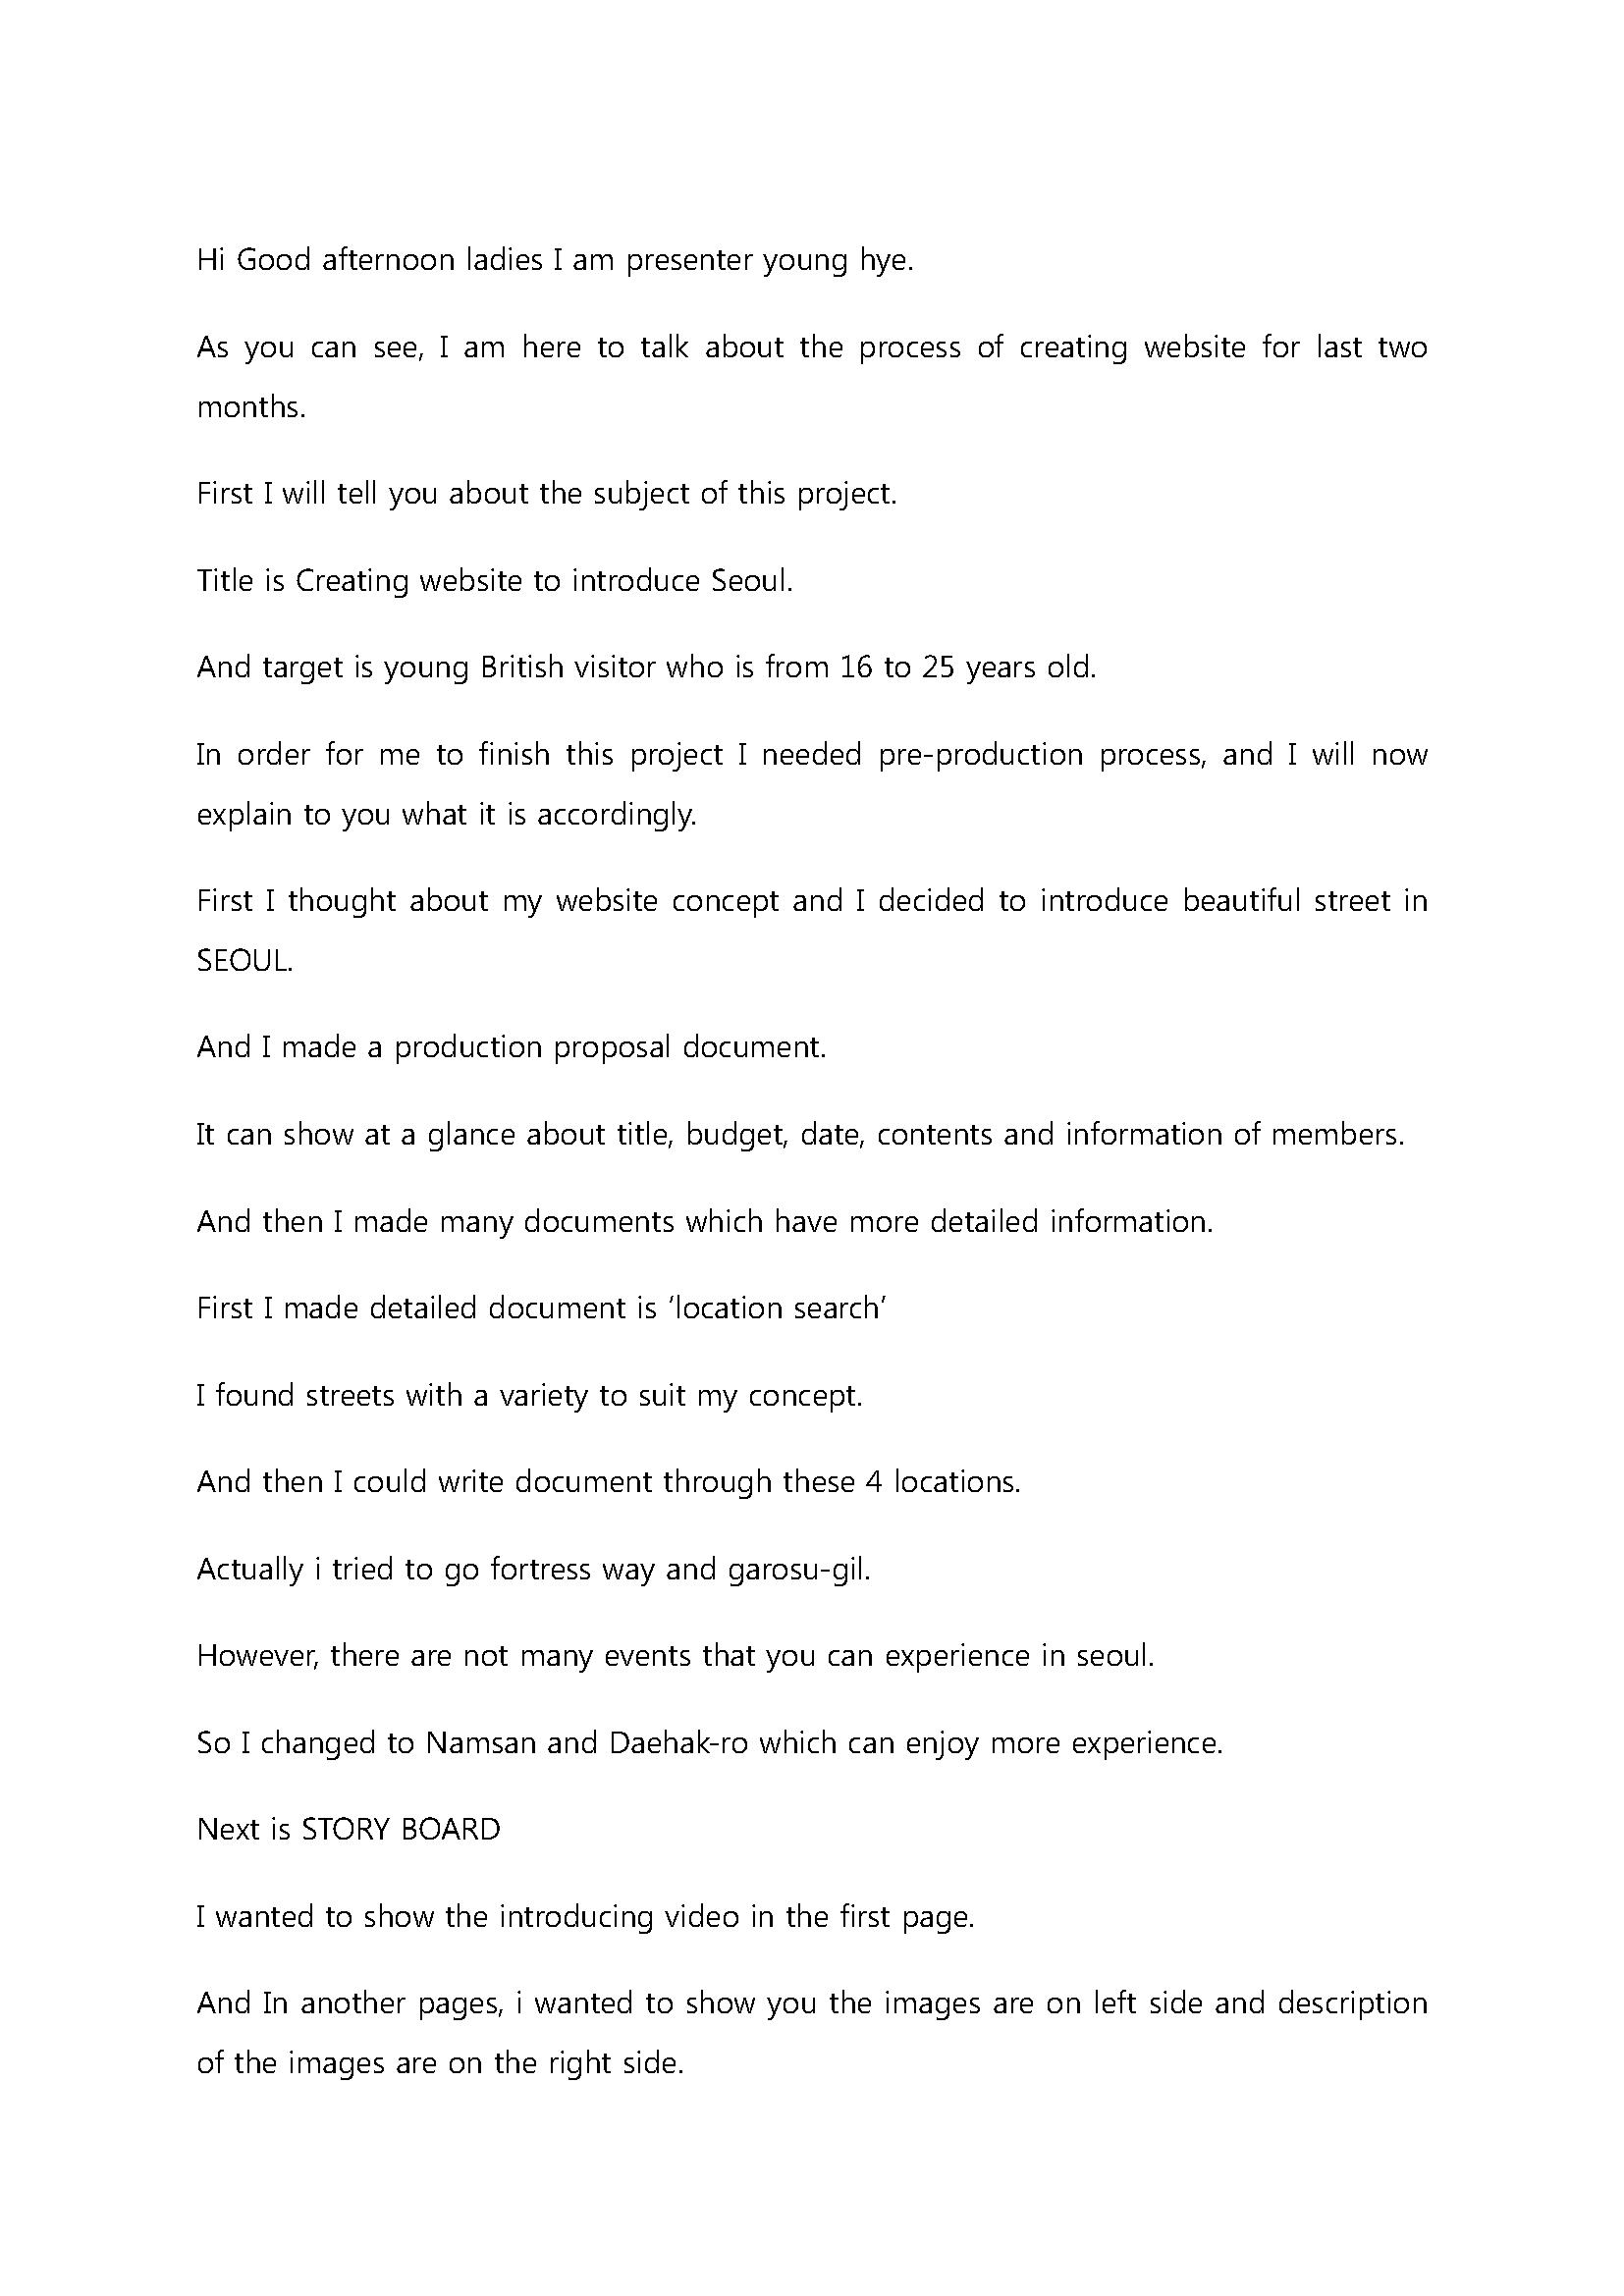 Script for presentation